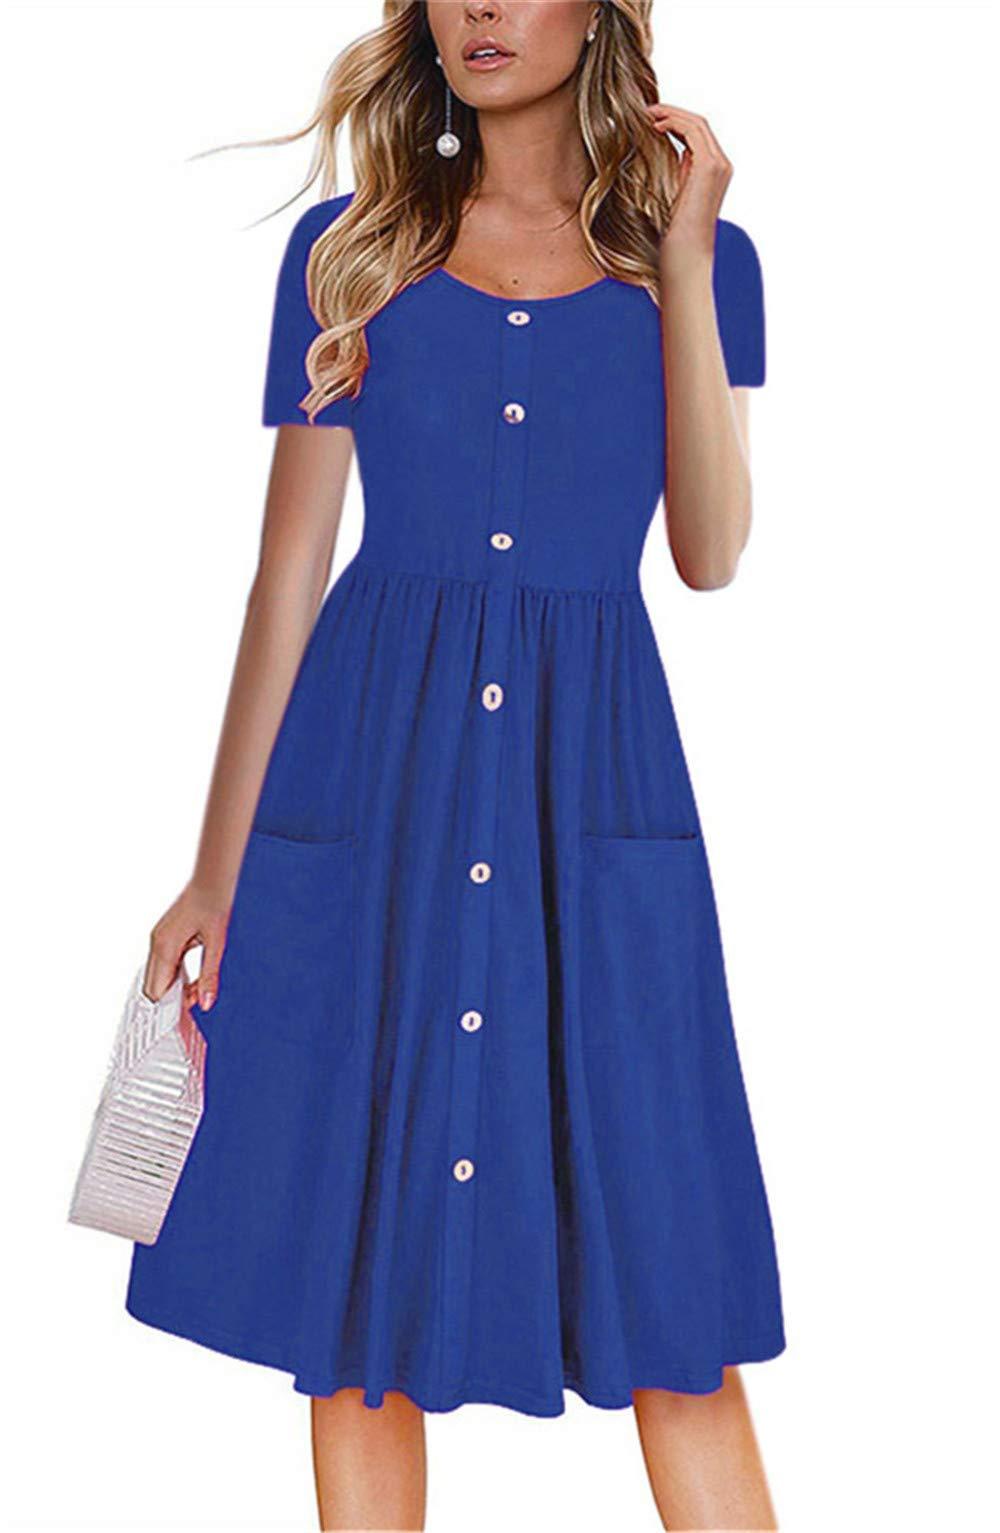 LAMISSCHE Womens Summer Casual Short Sleeve V Neck Button Down A-line Dress with Pockets(Bright Blue,3XL) by LAMISSCHE